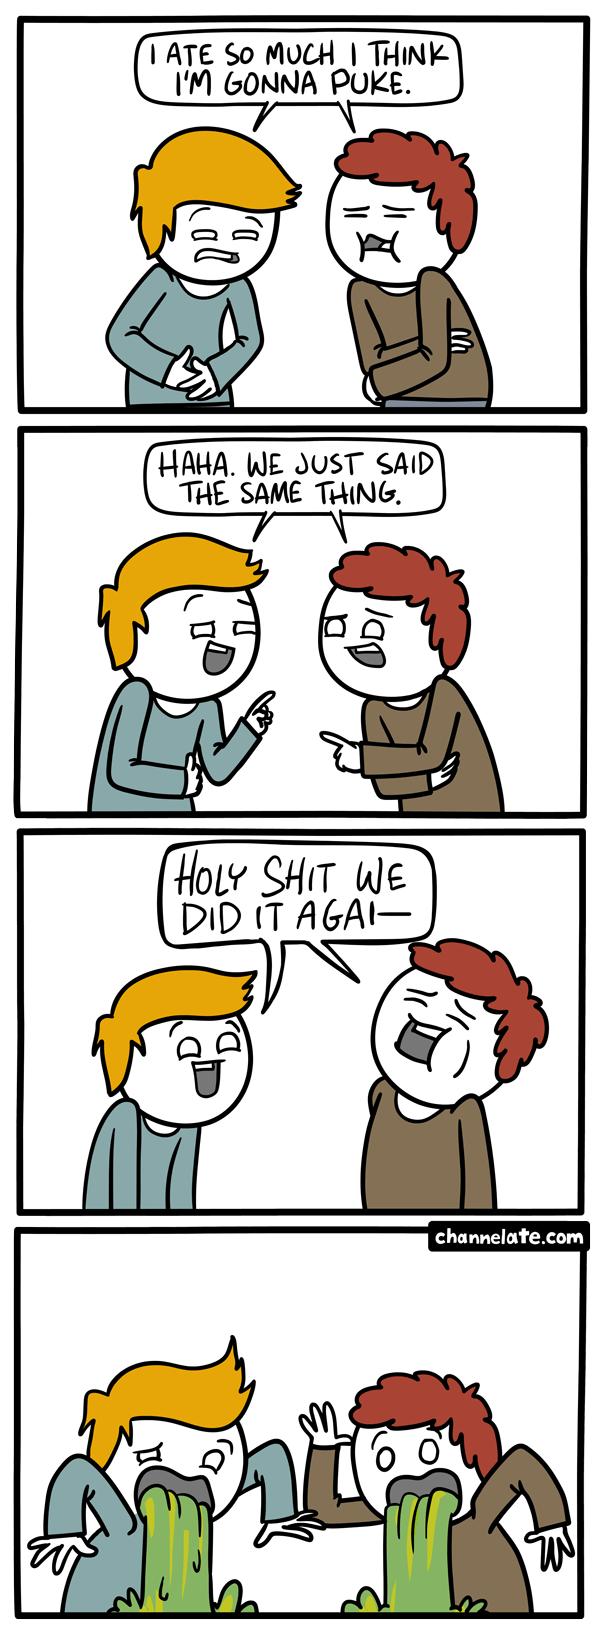 Puke.